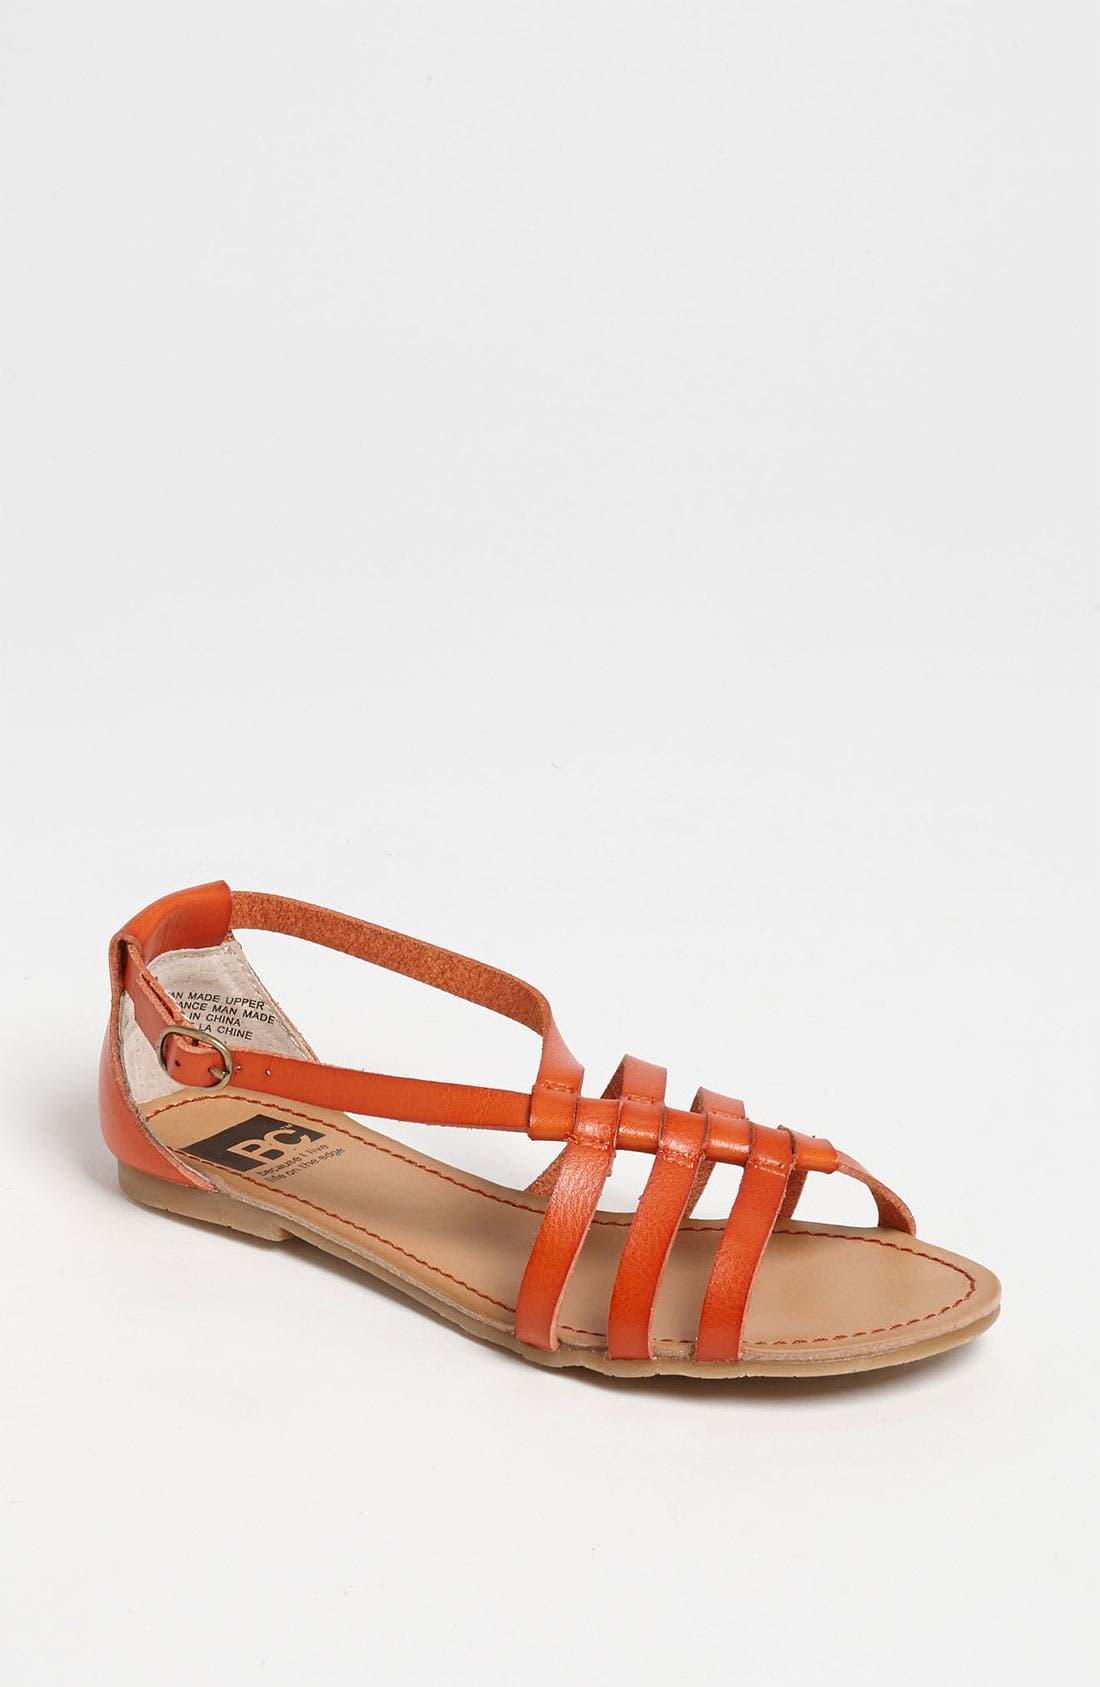 Main Image - BC Footwear 'At Large' Sandal